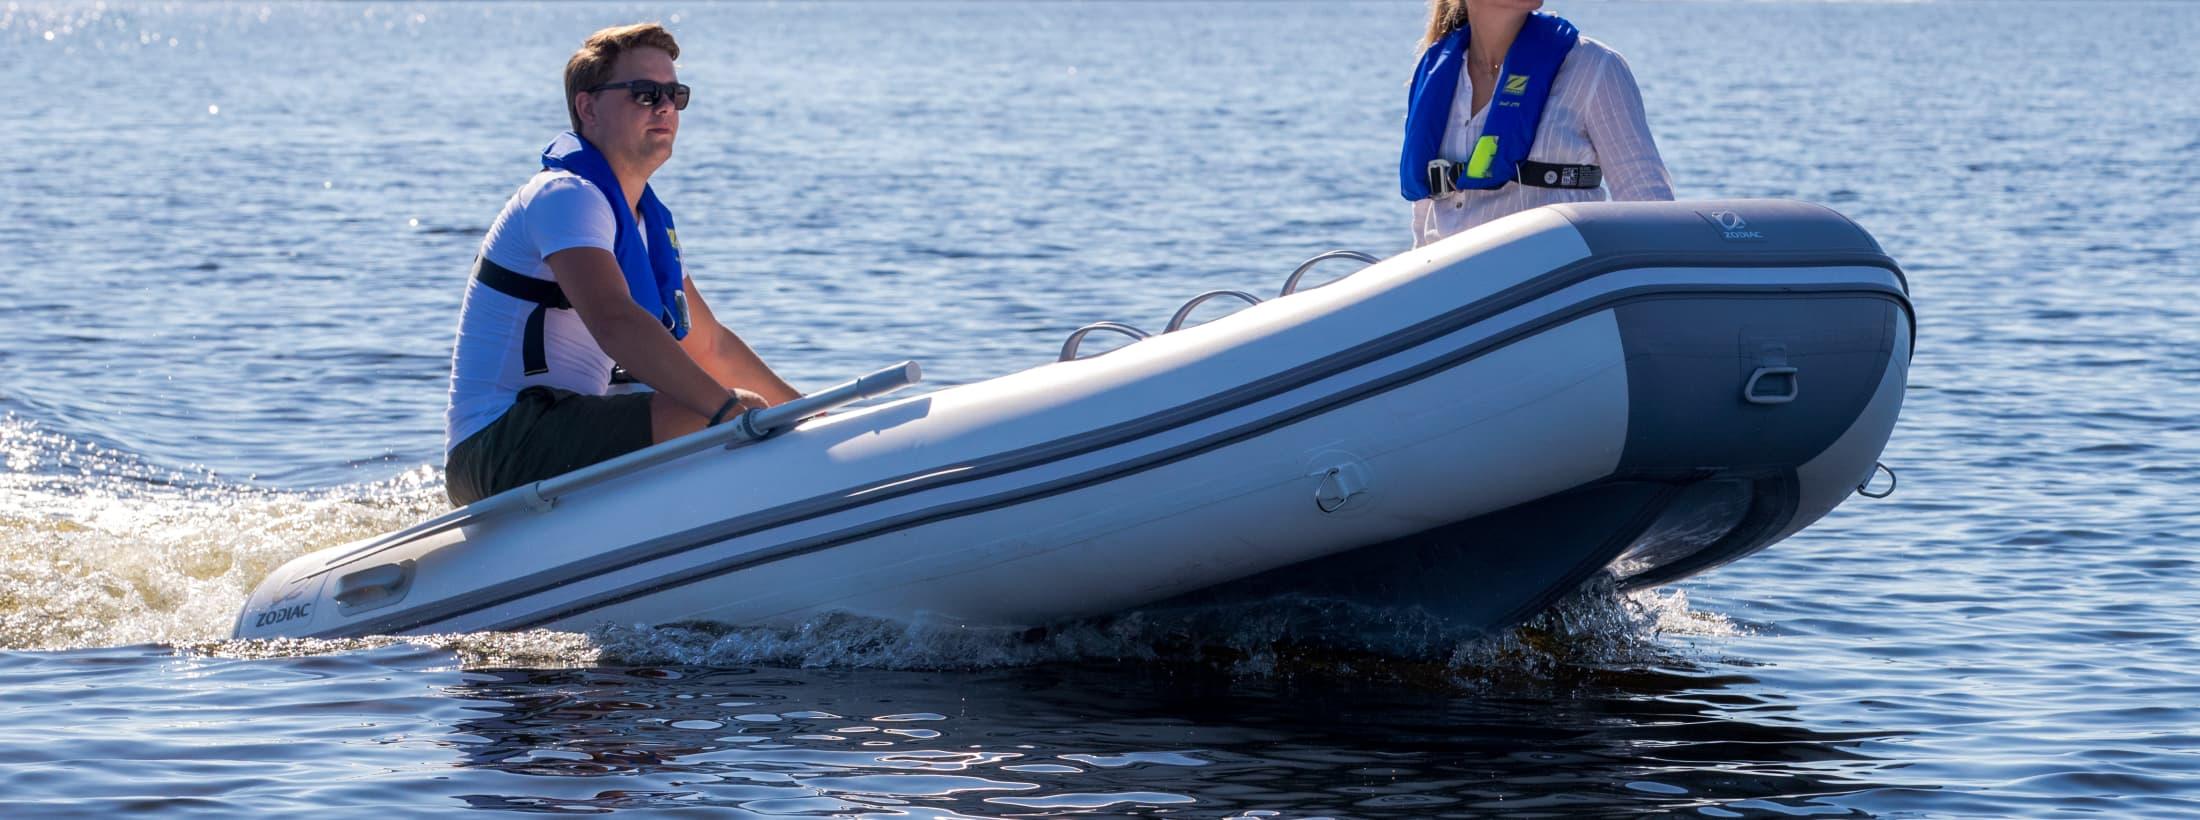 Cadet - gummibåter av kvalitet Zodiac - kvalitetsbåter siden 1934